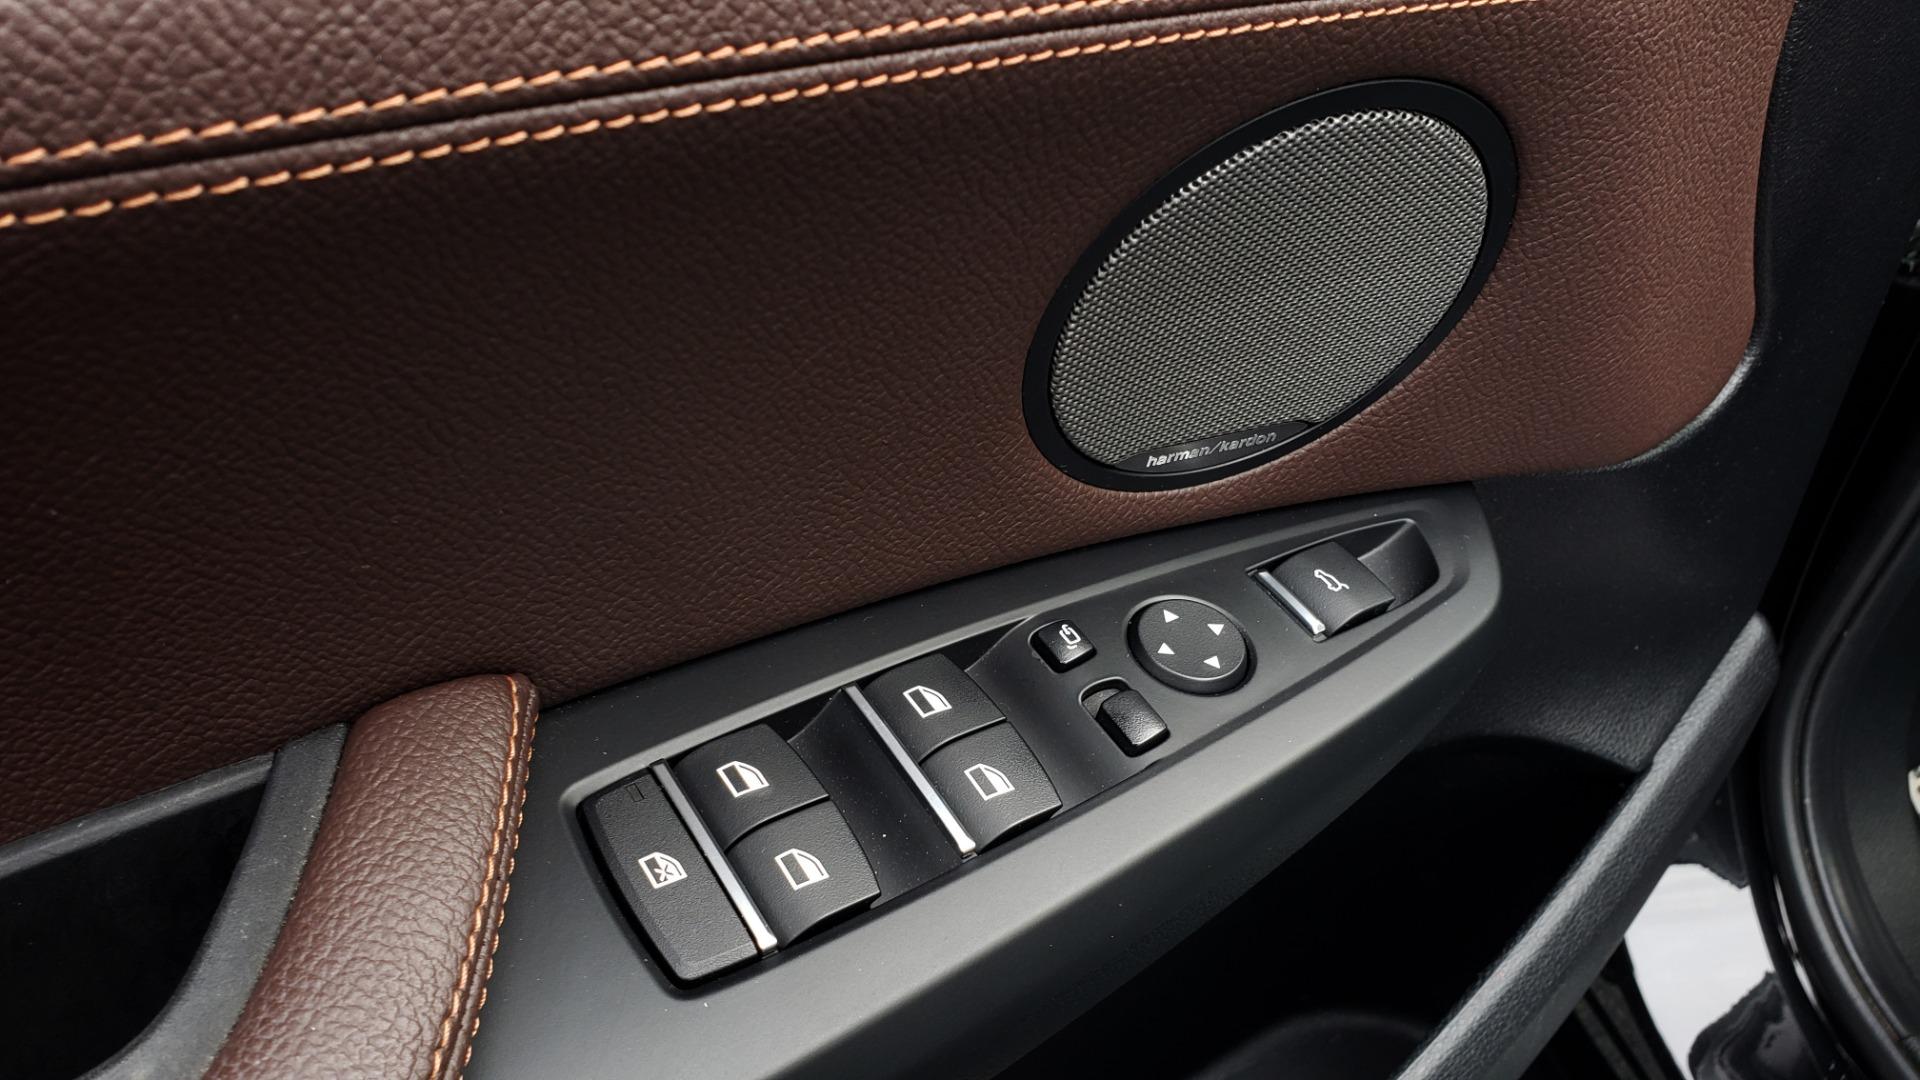 Used 2017 BMW X3 XDRIVE35I M-SPORT / DRVR ASST PLUS / TECHNOLOGY / HUD / BLIND SPOT for sale Sold at Formula Imports in Charlotte NC 28227 31